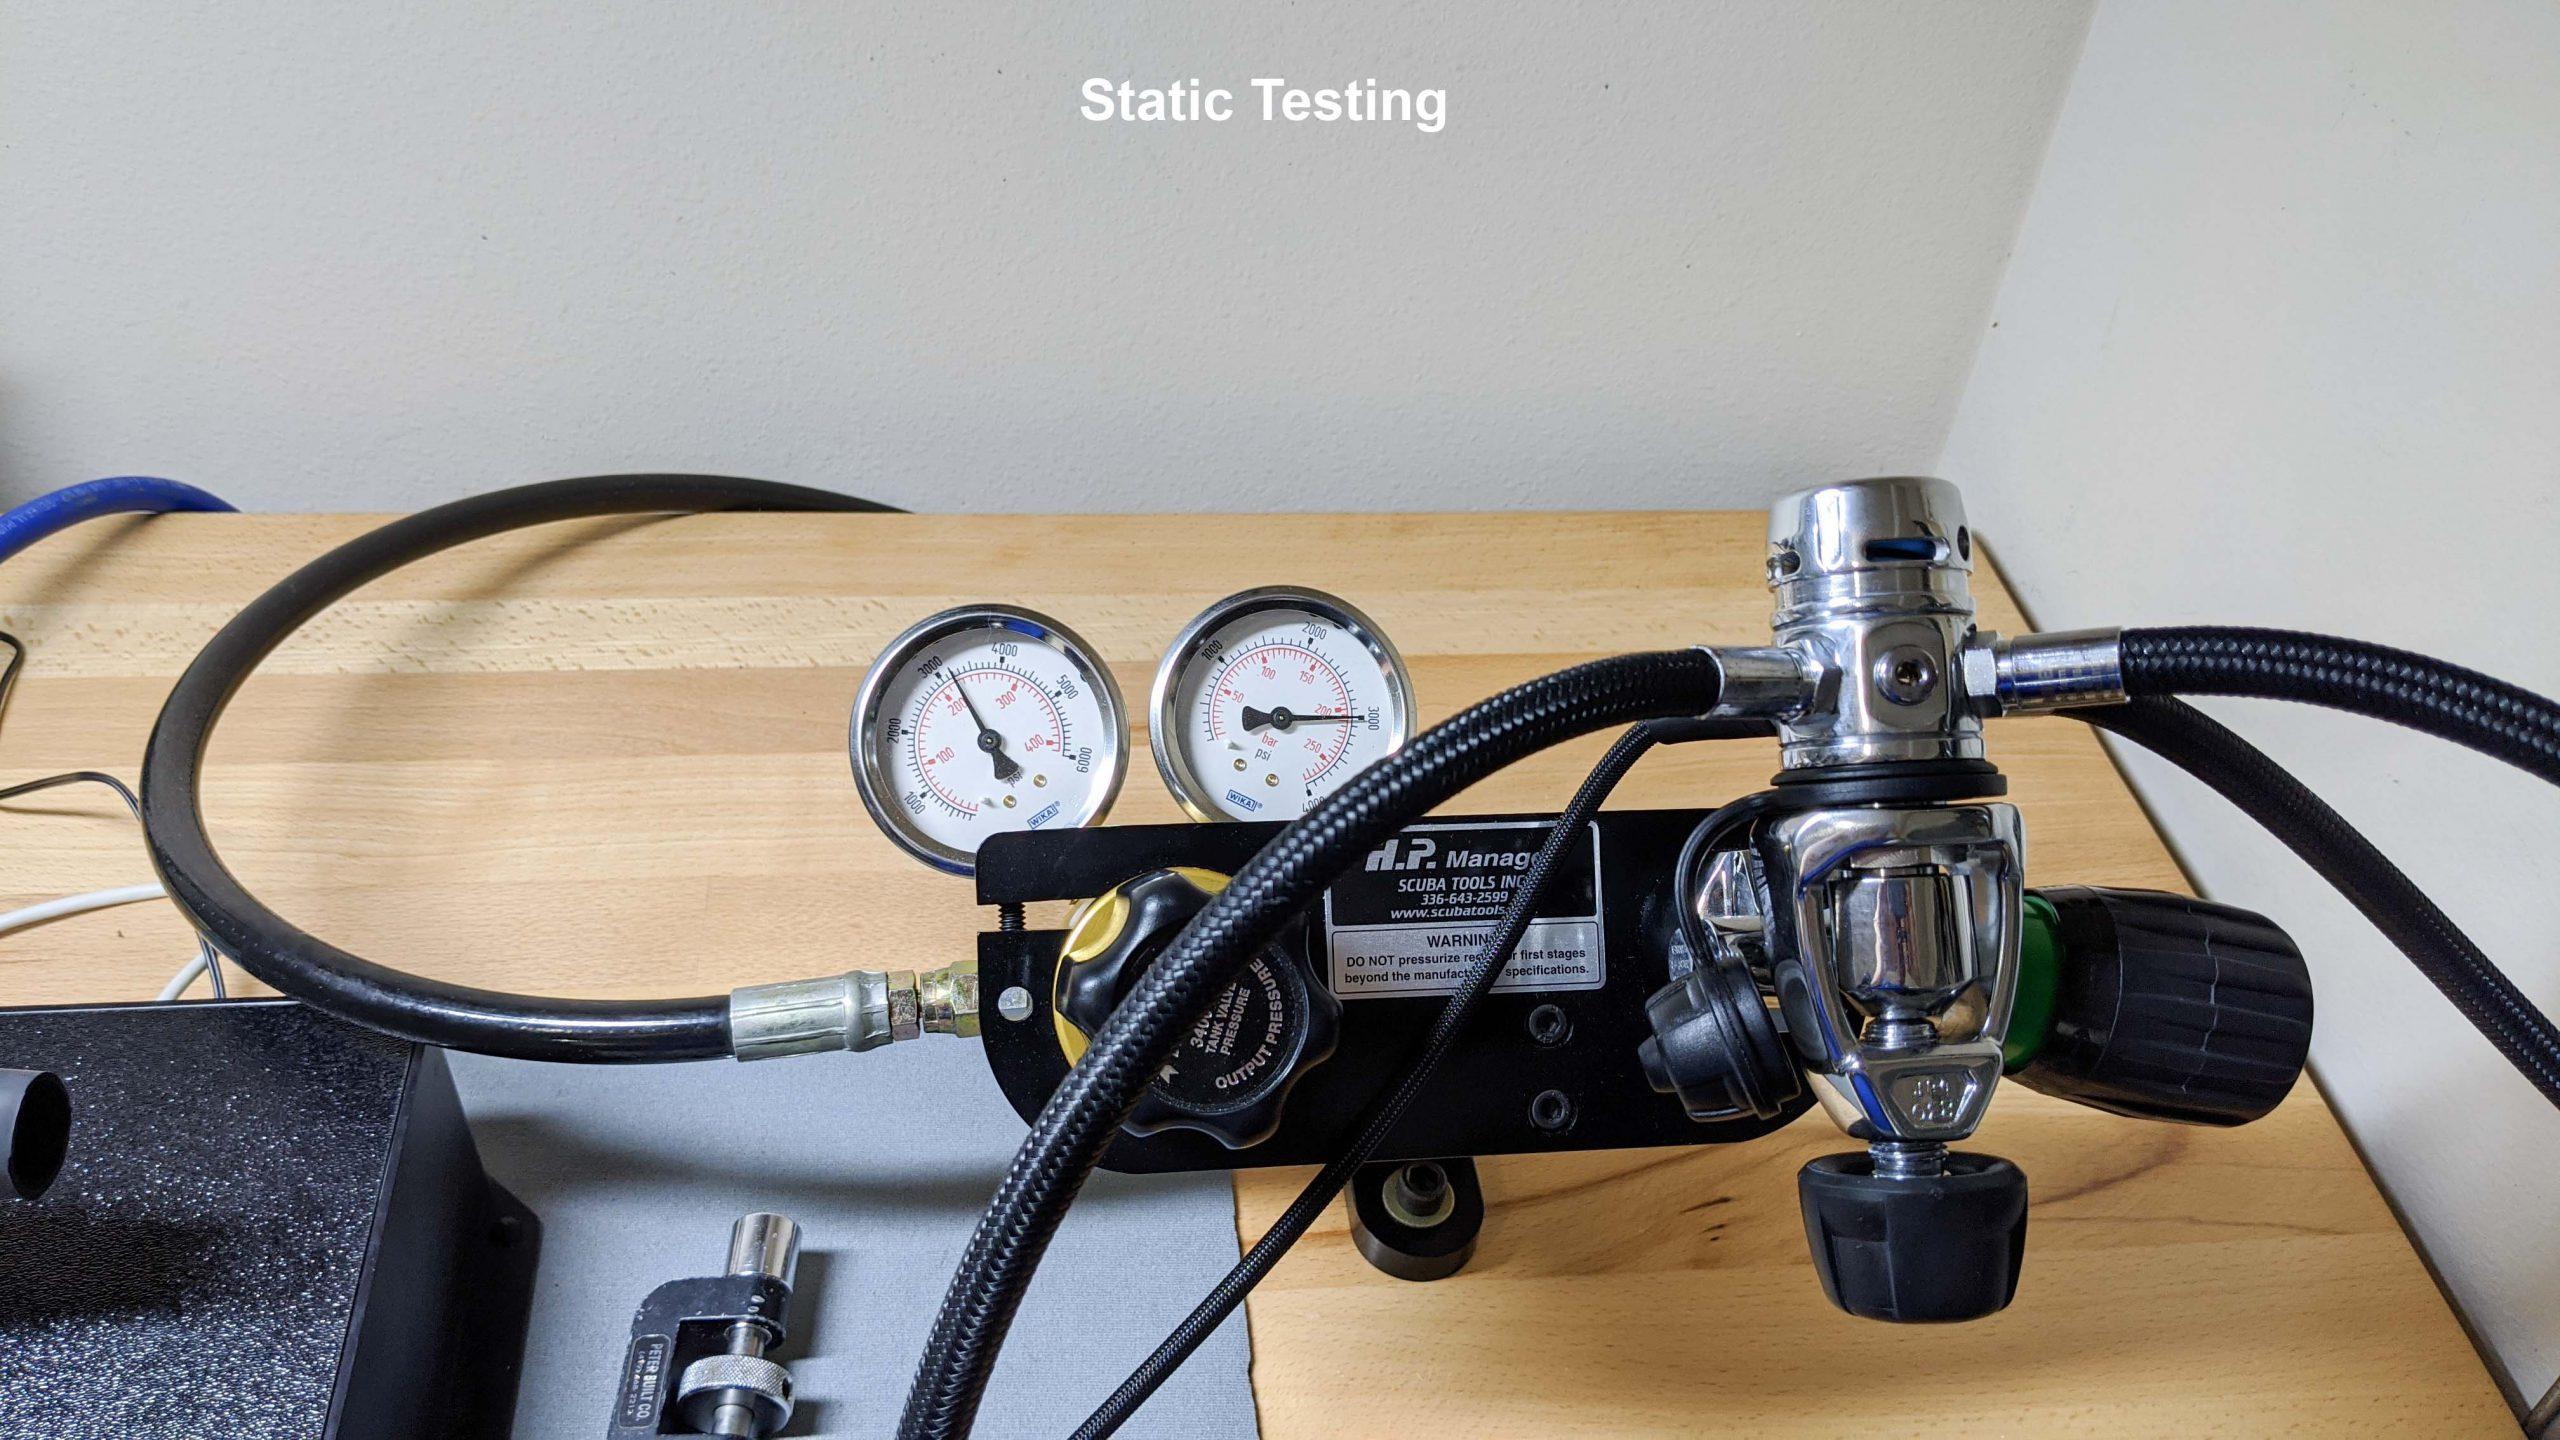 Static Flow Testing